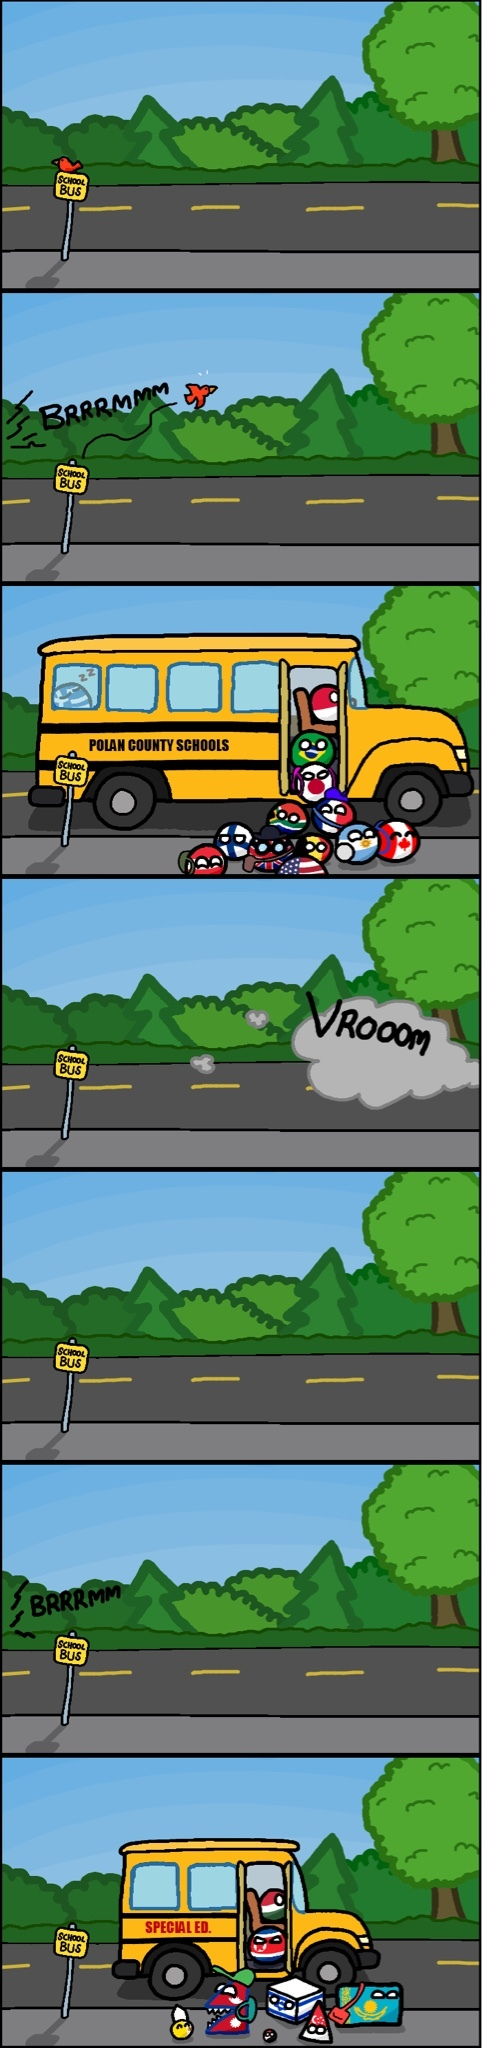 School bus - meme